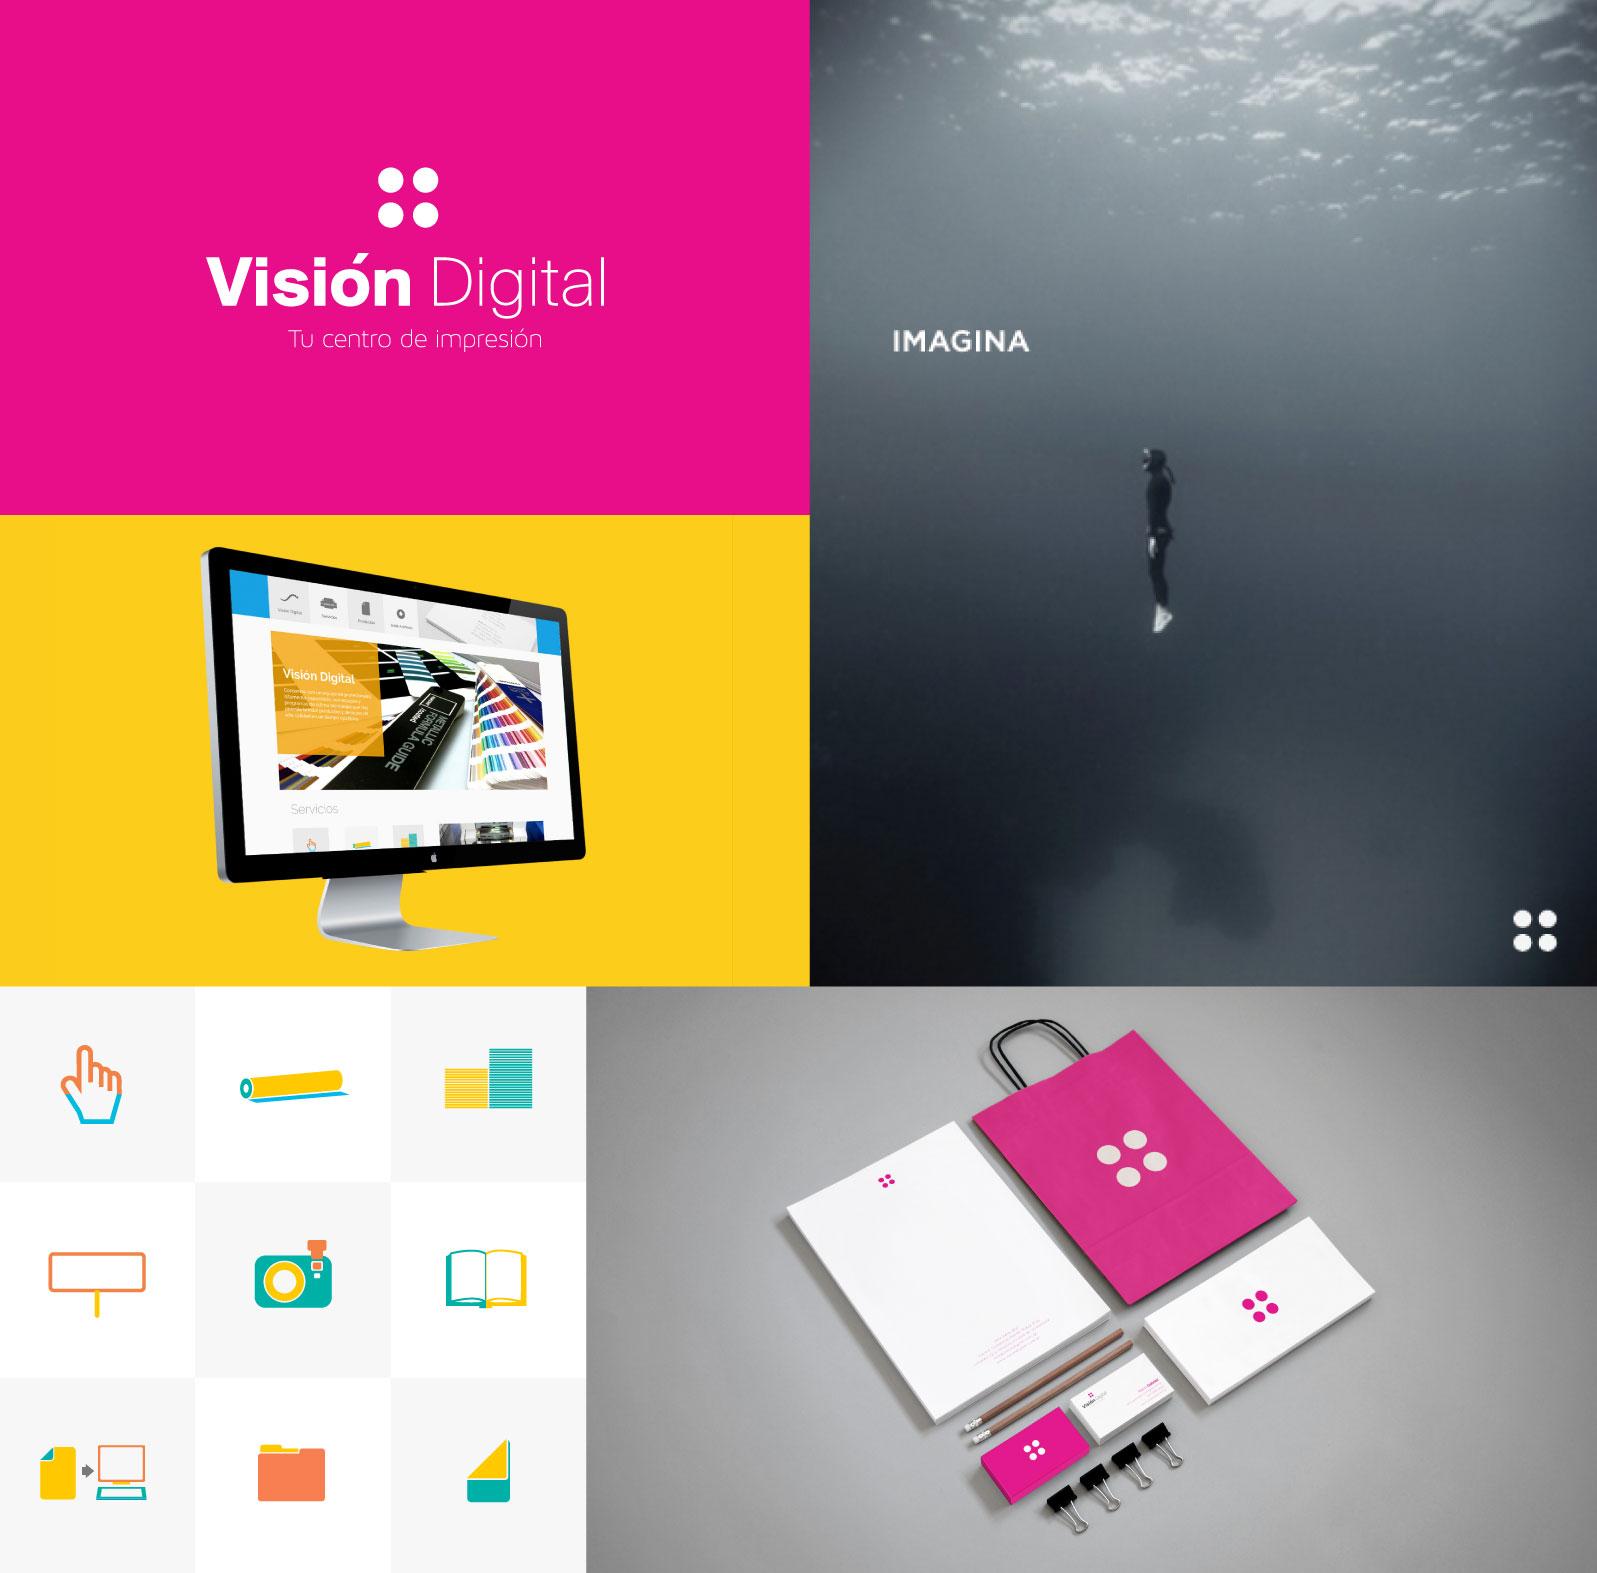 visiondigital